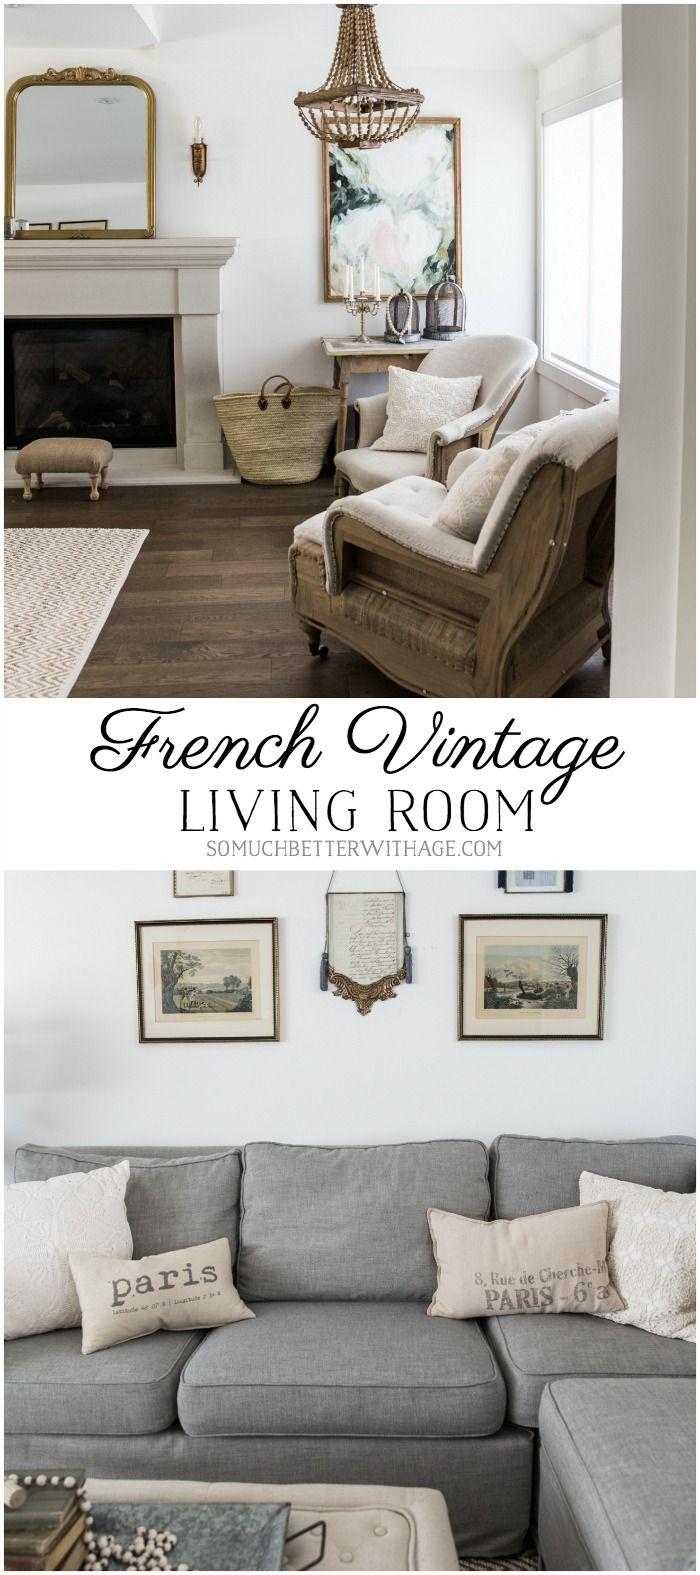 Inspirational Entry Living Room Ideas